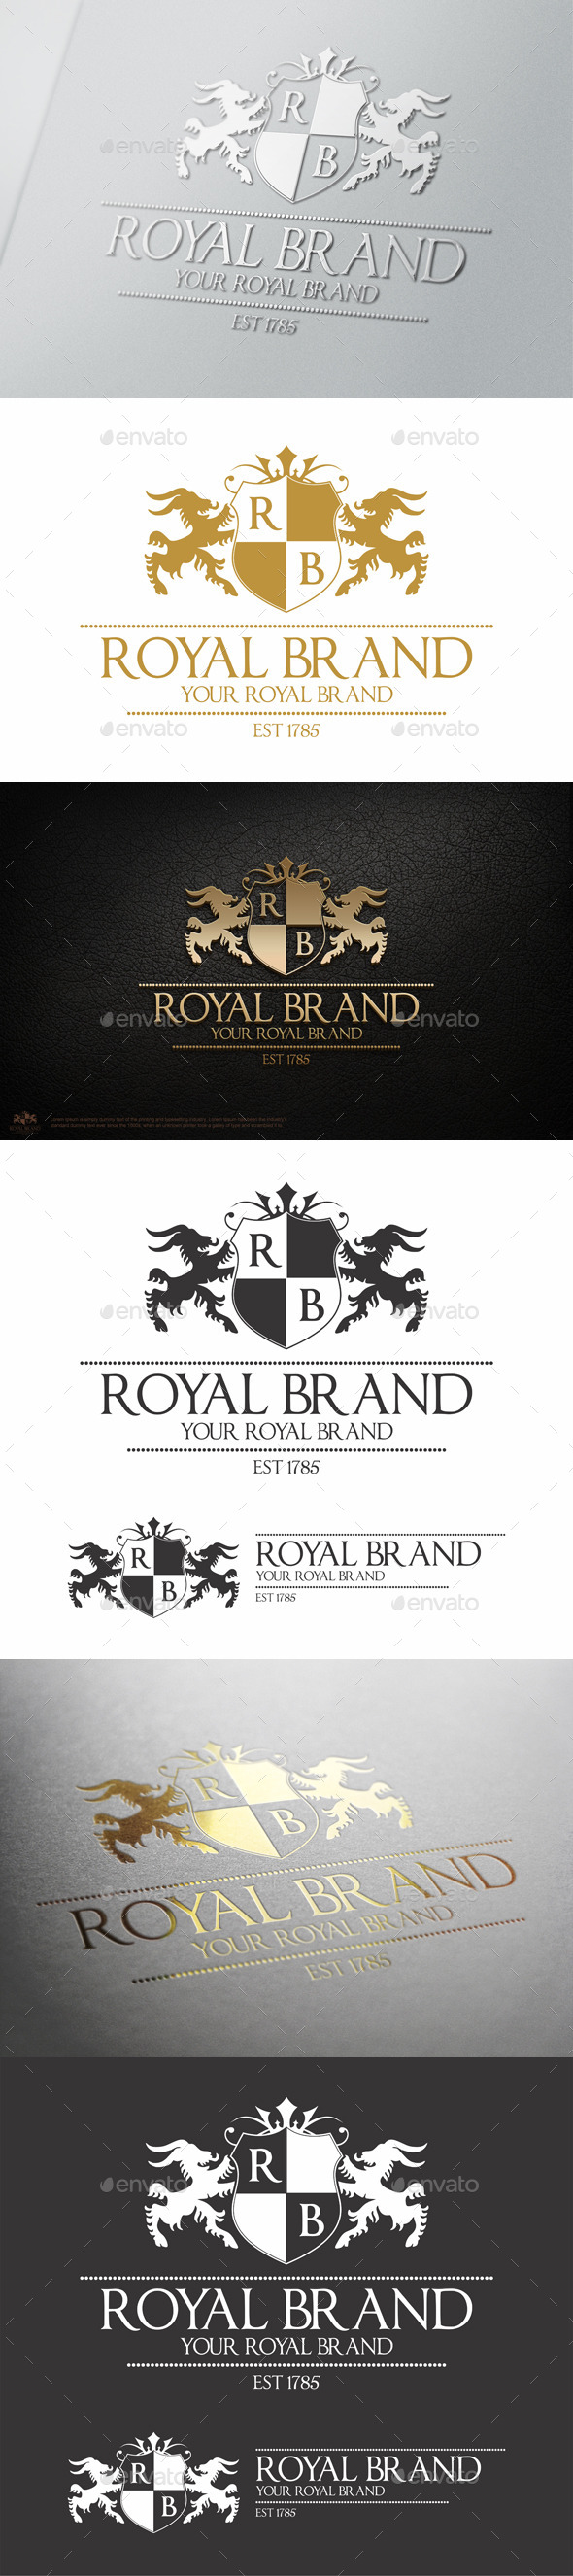 GraphicRiver Heraldic Royal Brand Crest Logo 9775442